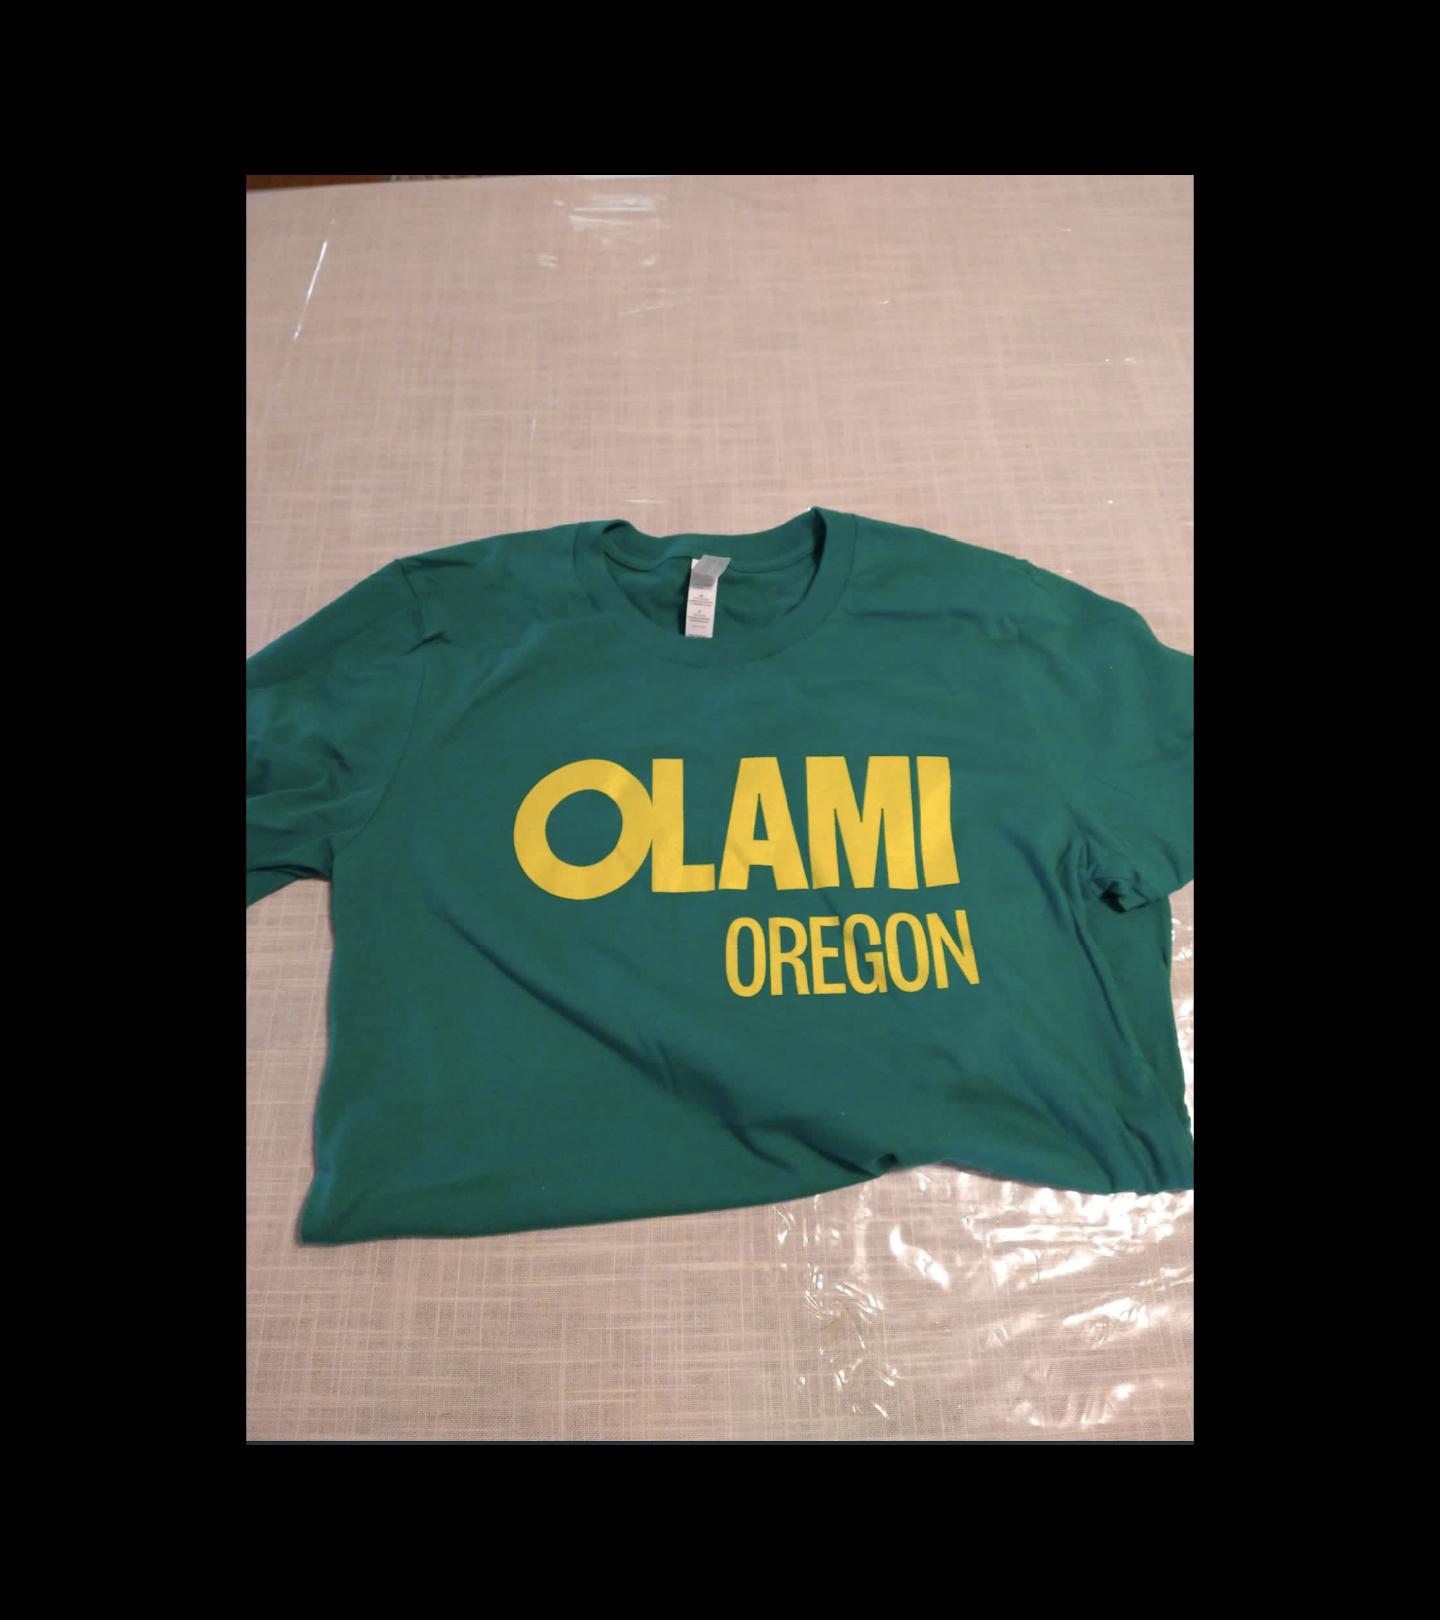 Olami-1-copy-13j